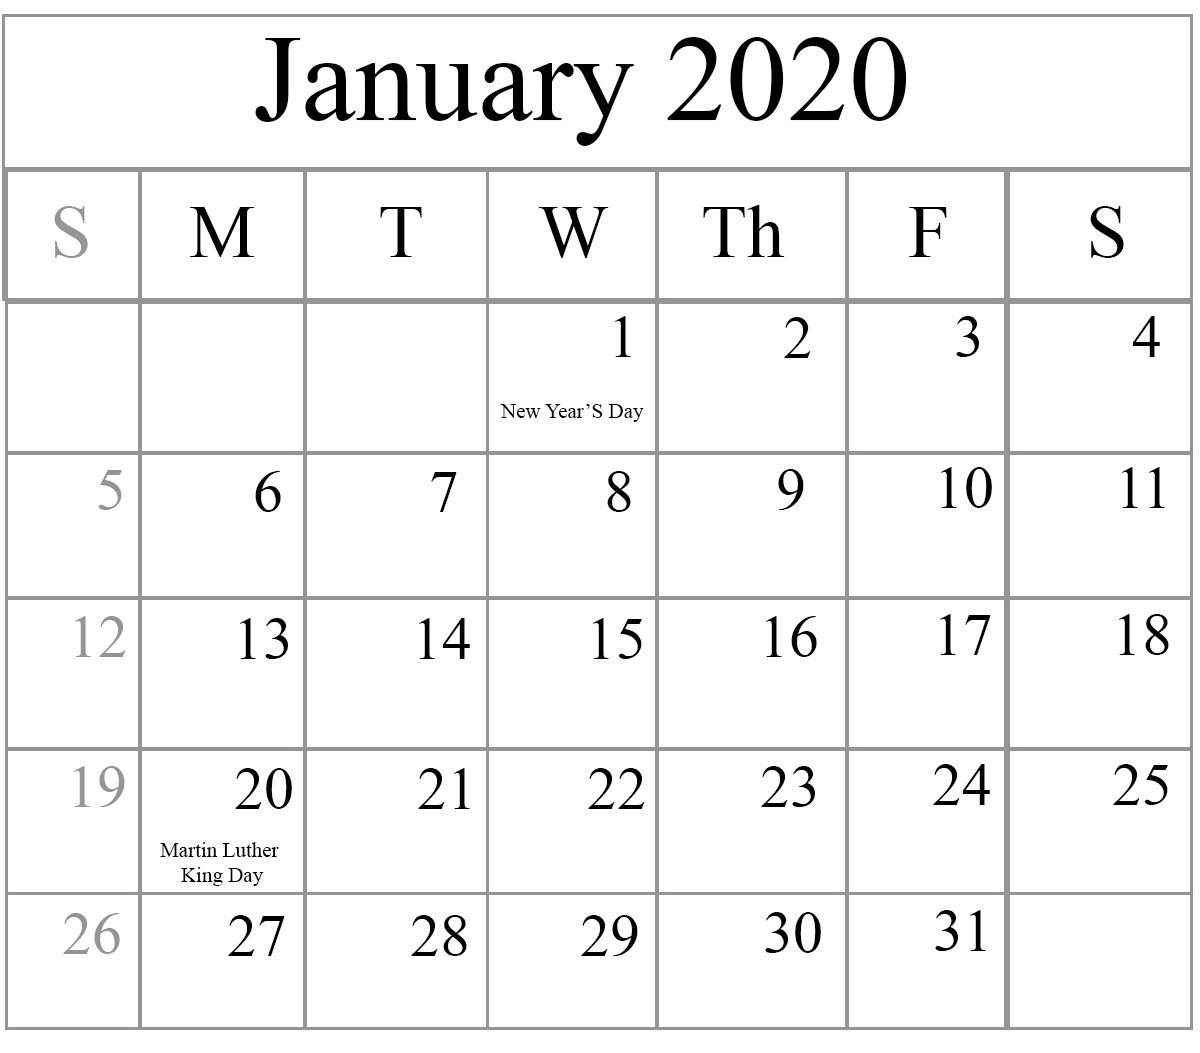 Blank January 2020 Calendar Printable In Pdf, Word, Excel-Free Printable January 2020 Calendar Template